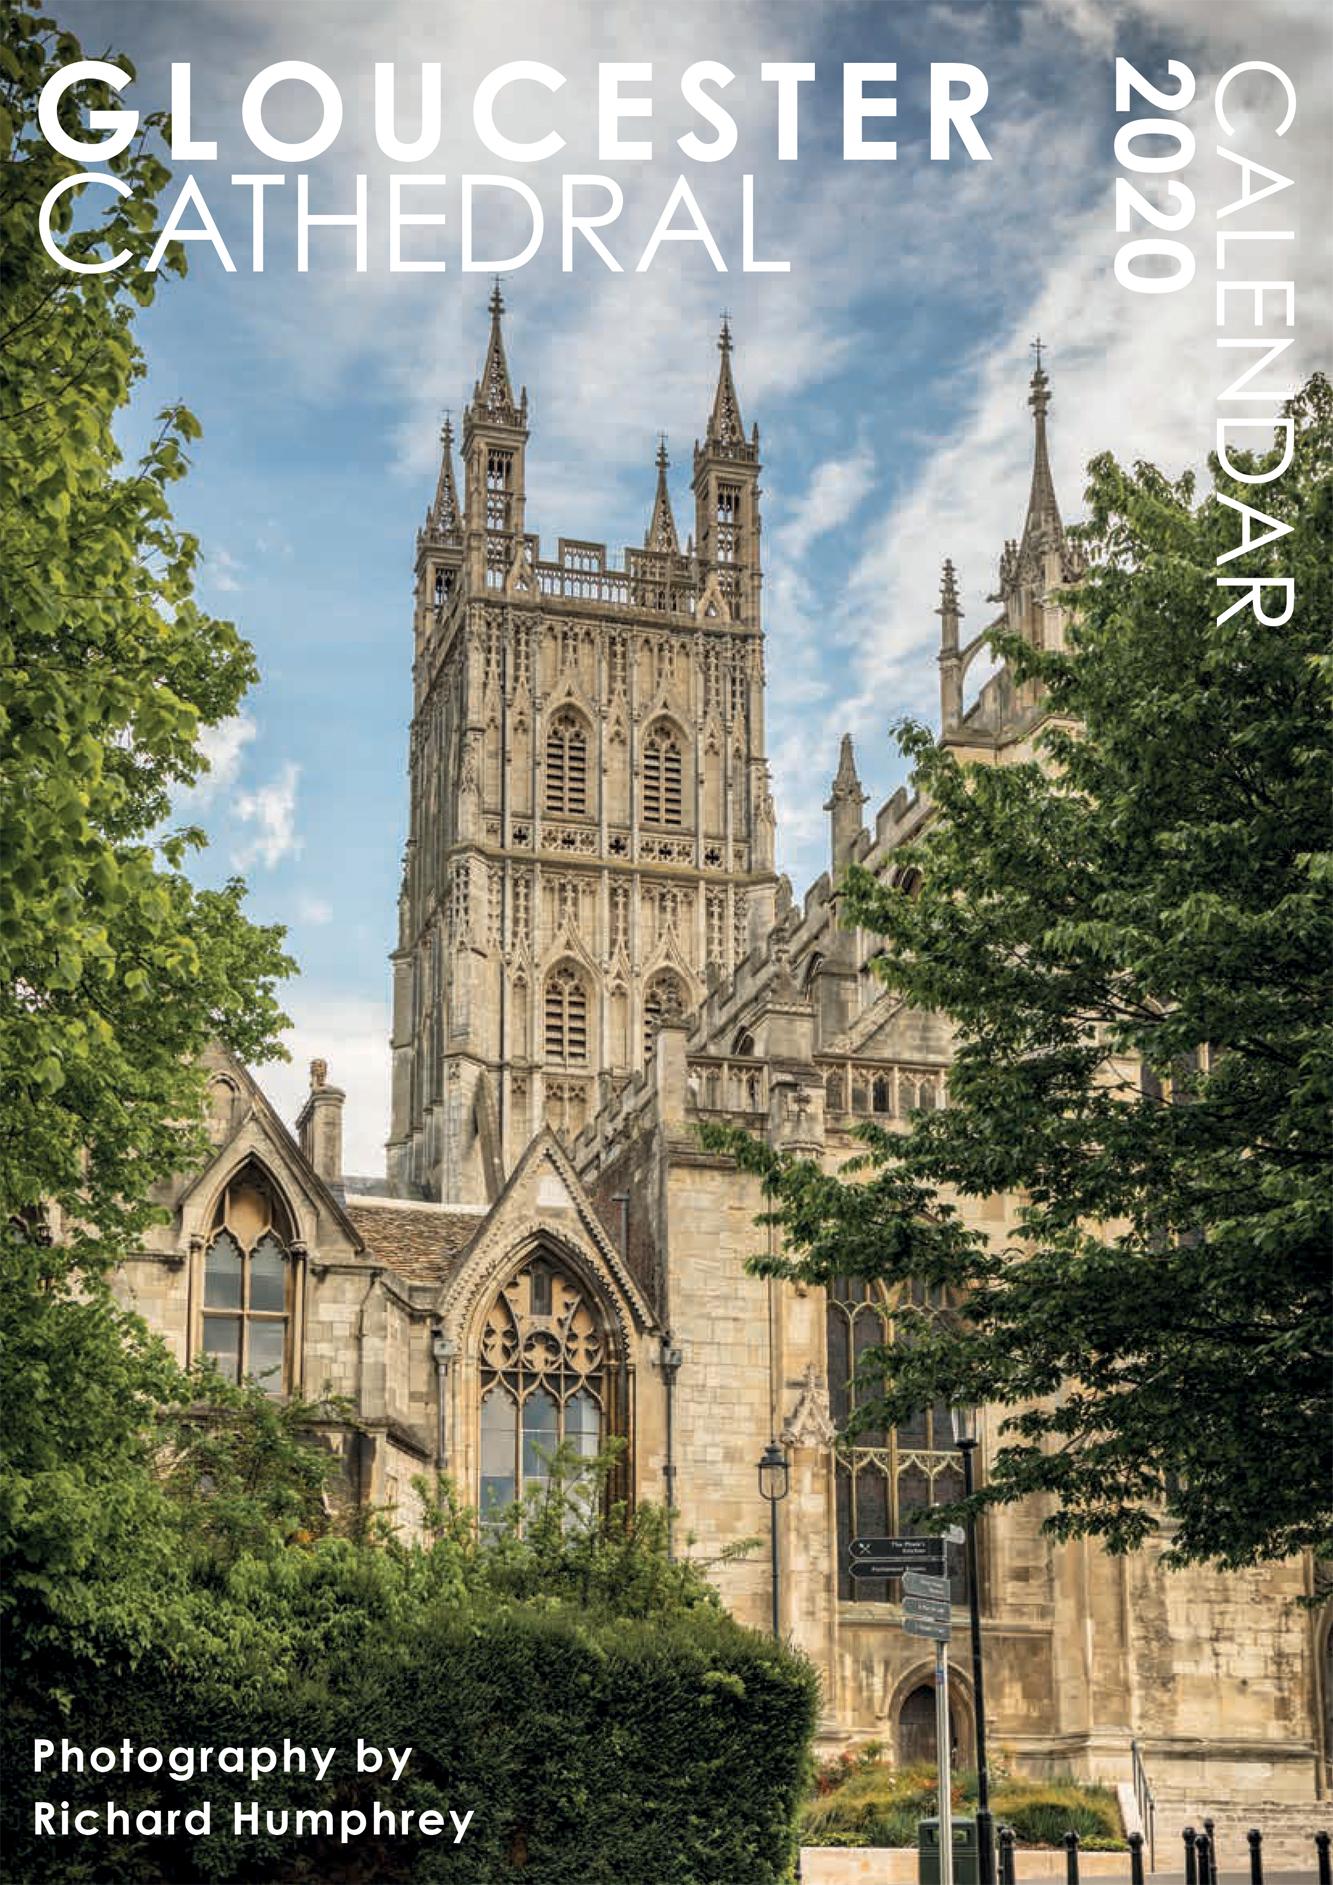 Gloucester Cathedral Calendar 2020